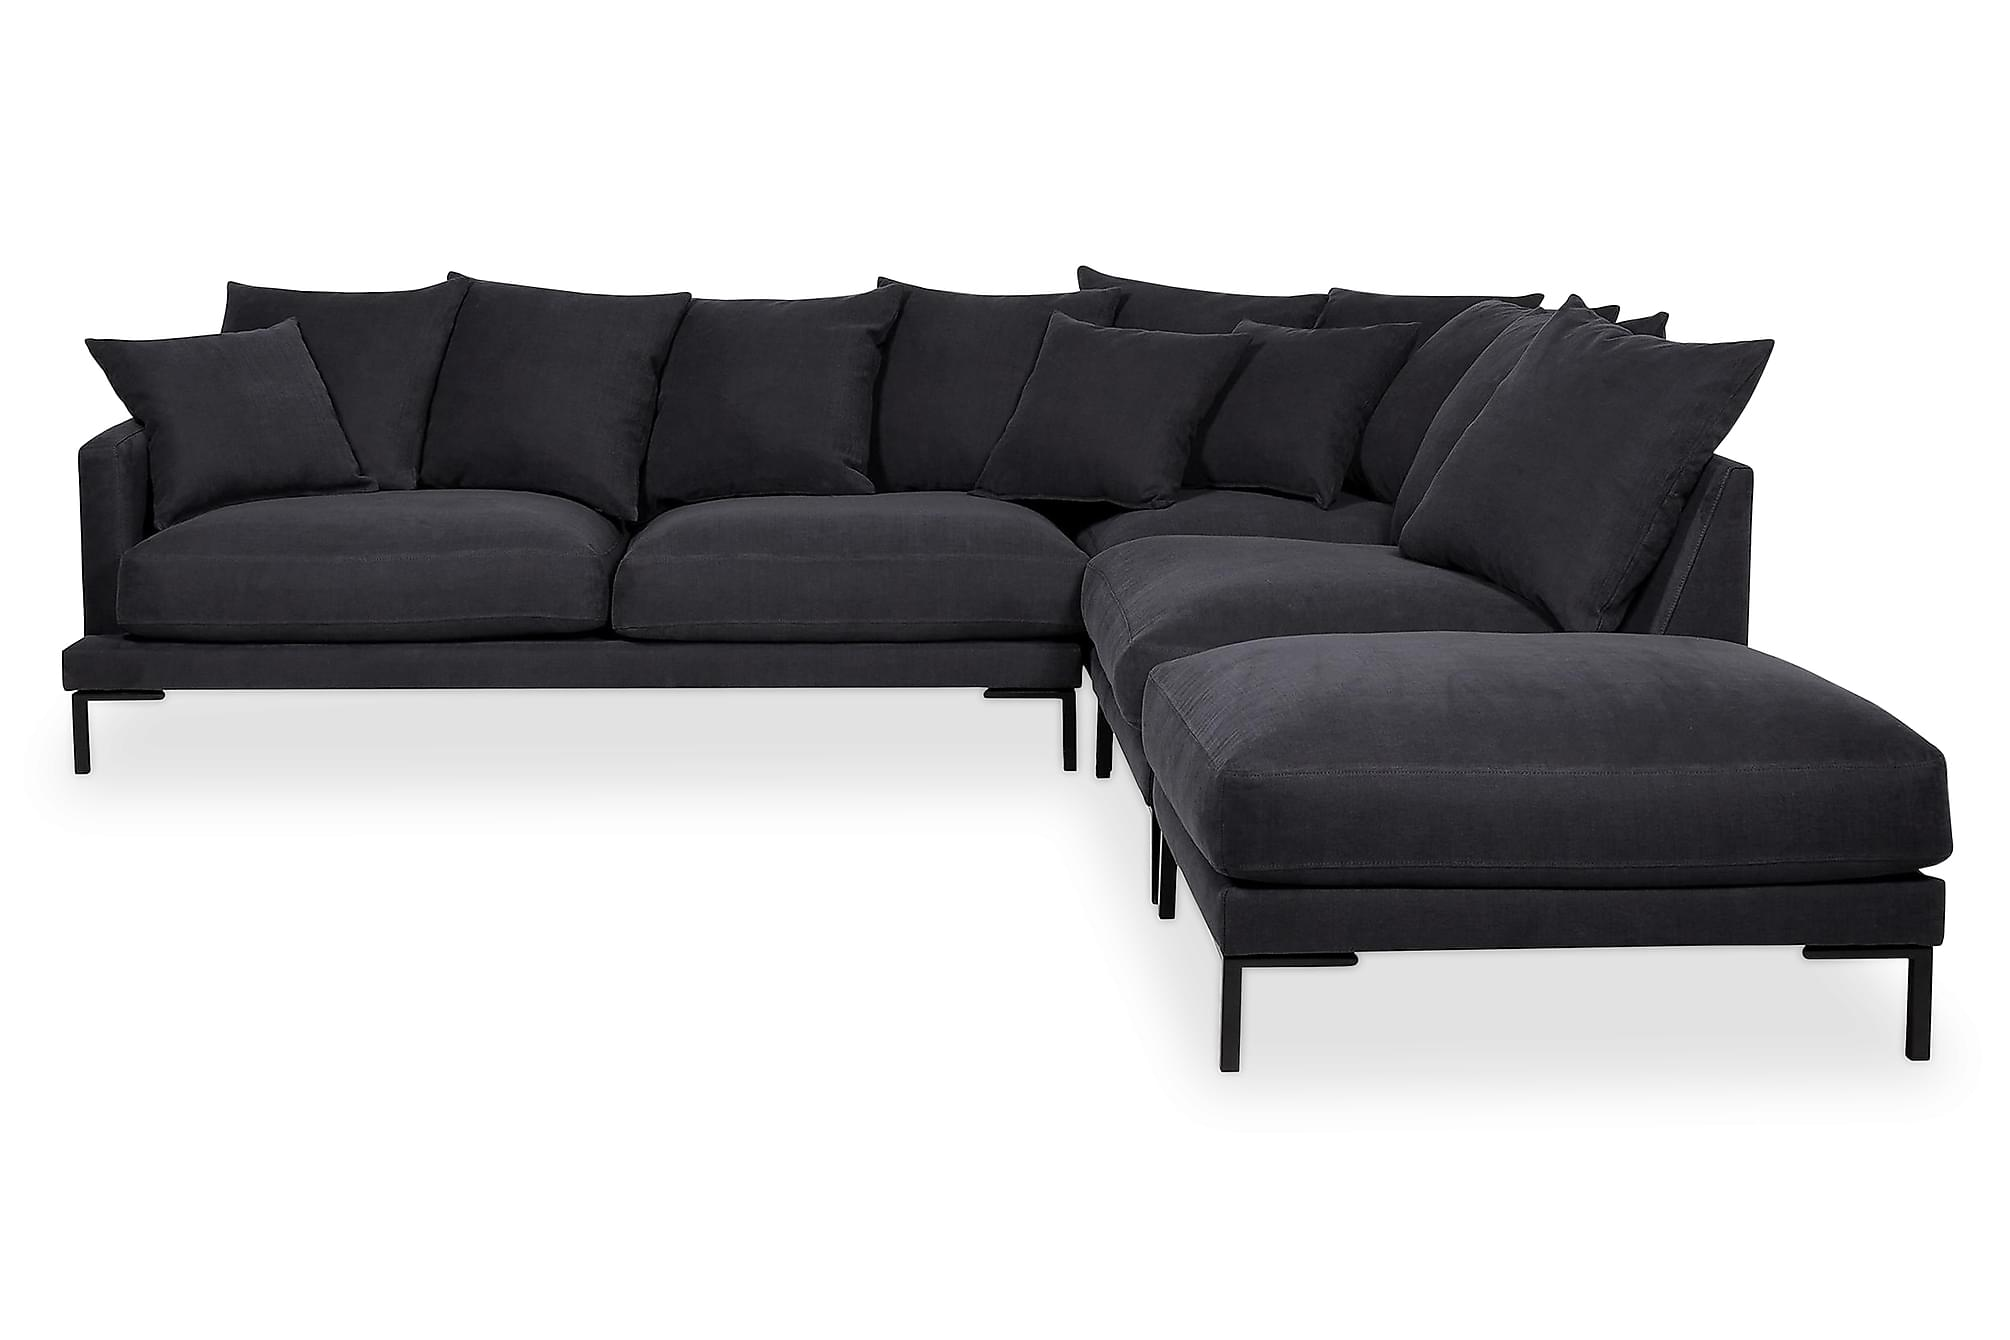 MONDIAL 3-sits Soffa med Schäslong Höger Mörkgrå